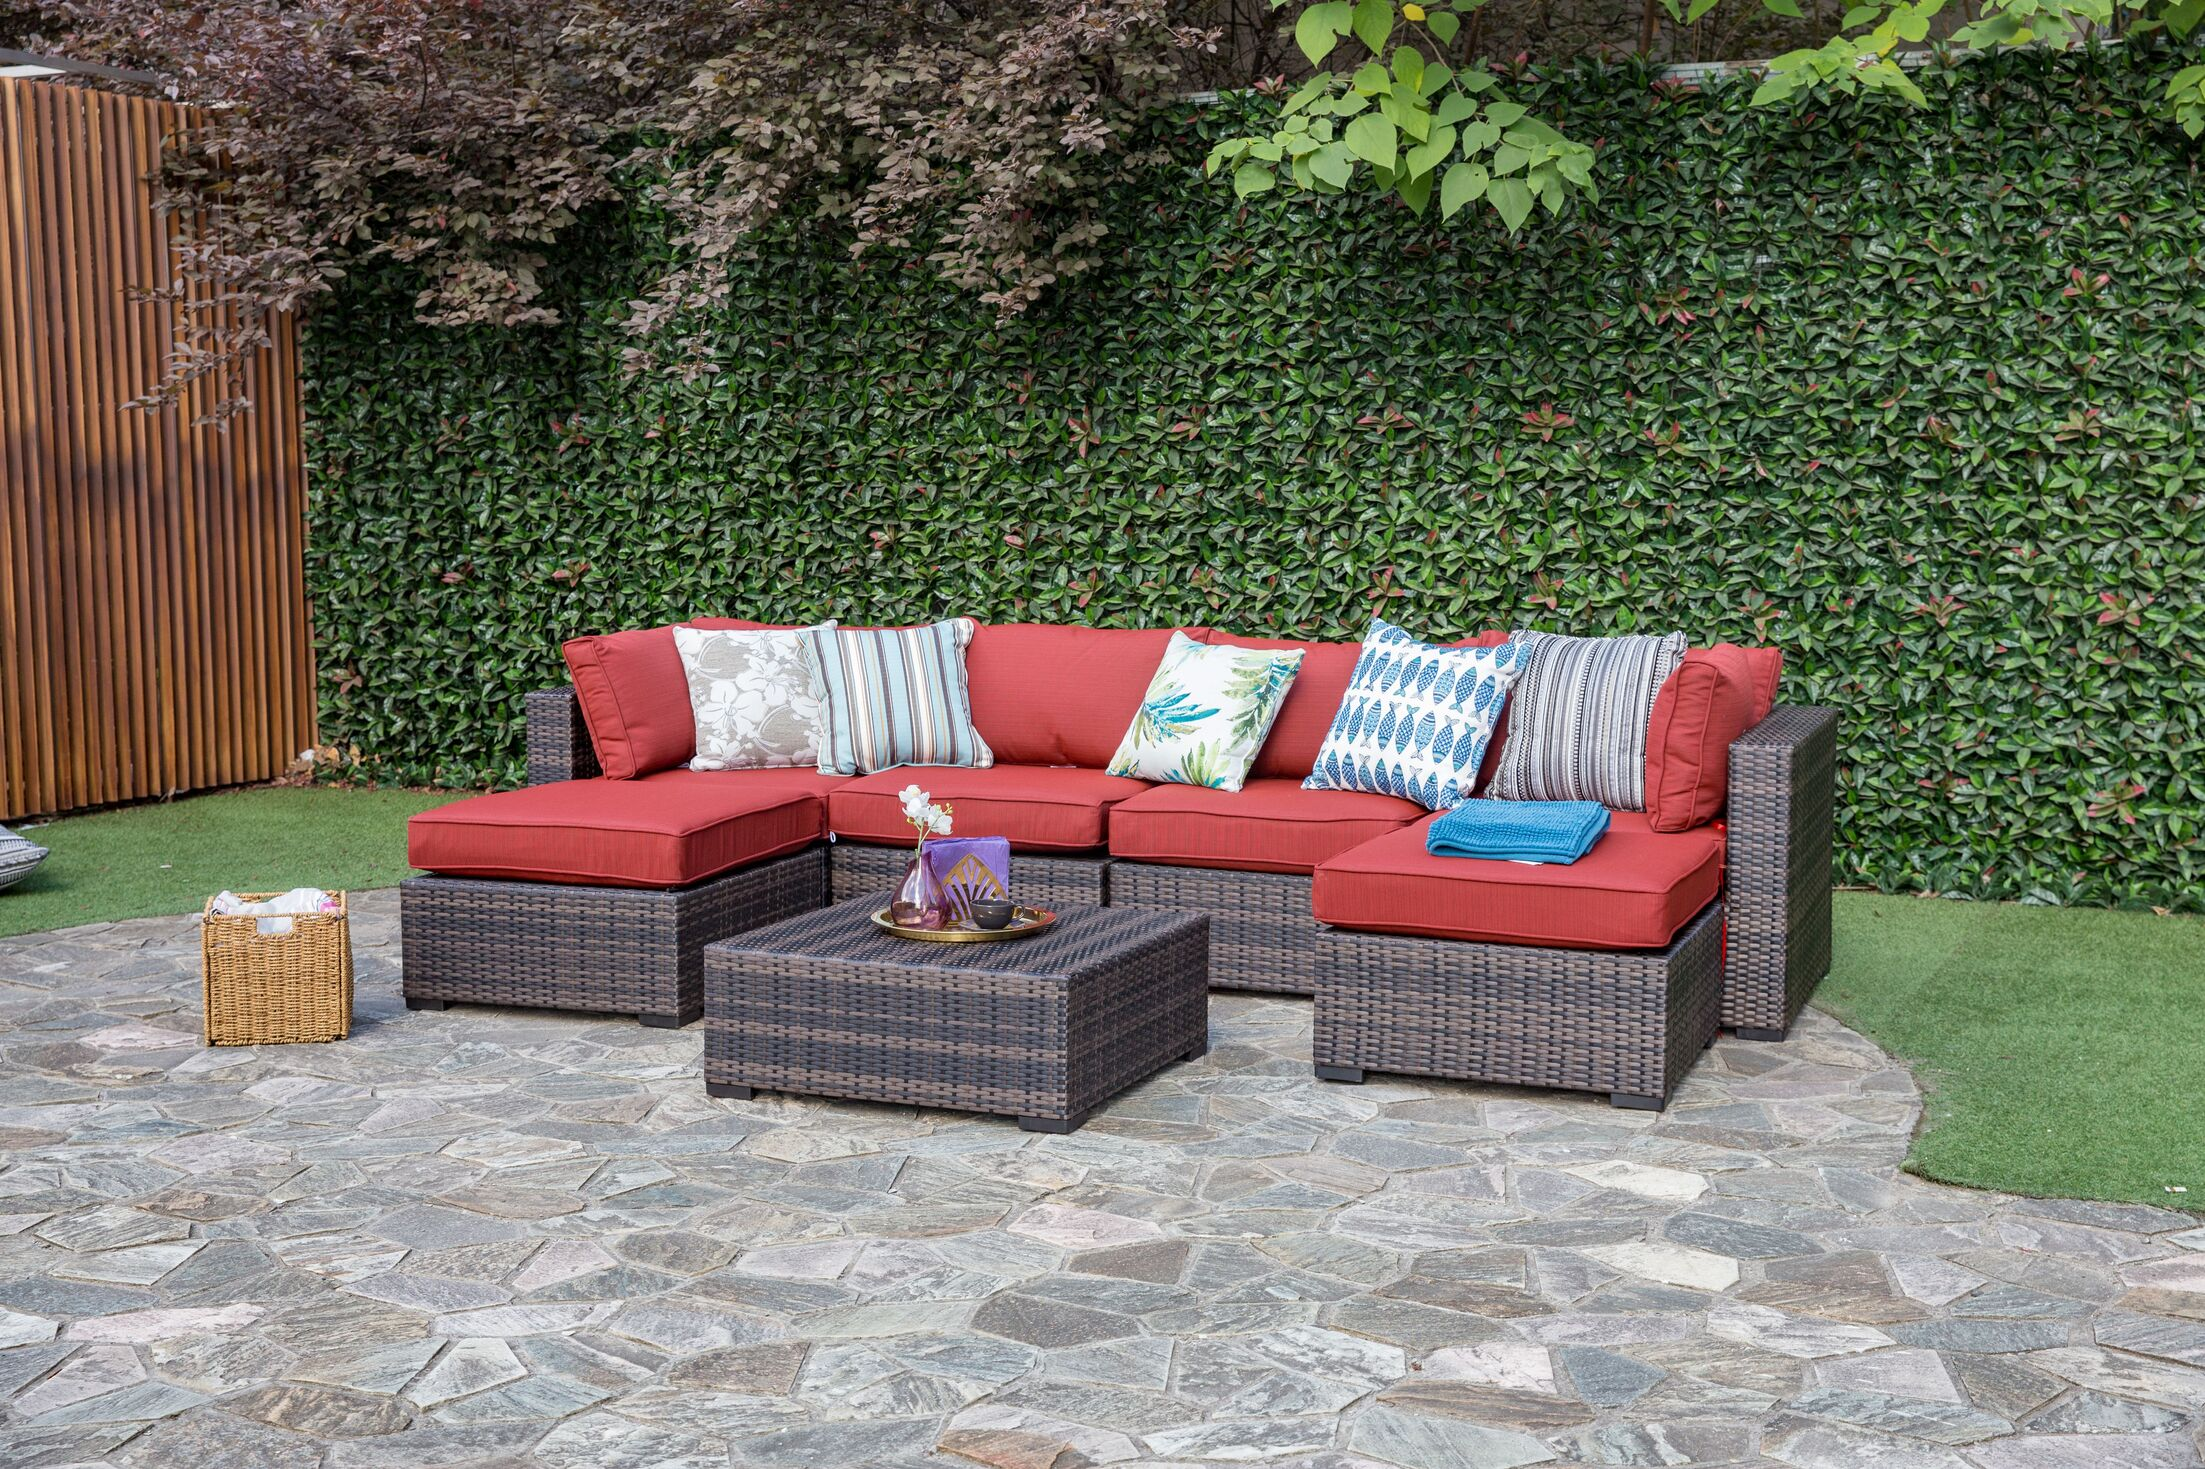 Lara 7 Piece Sectional Set with Cushions Fabric: Ribbed Brick